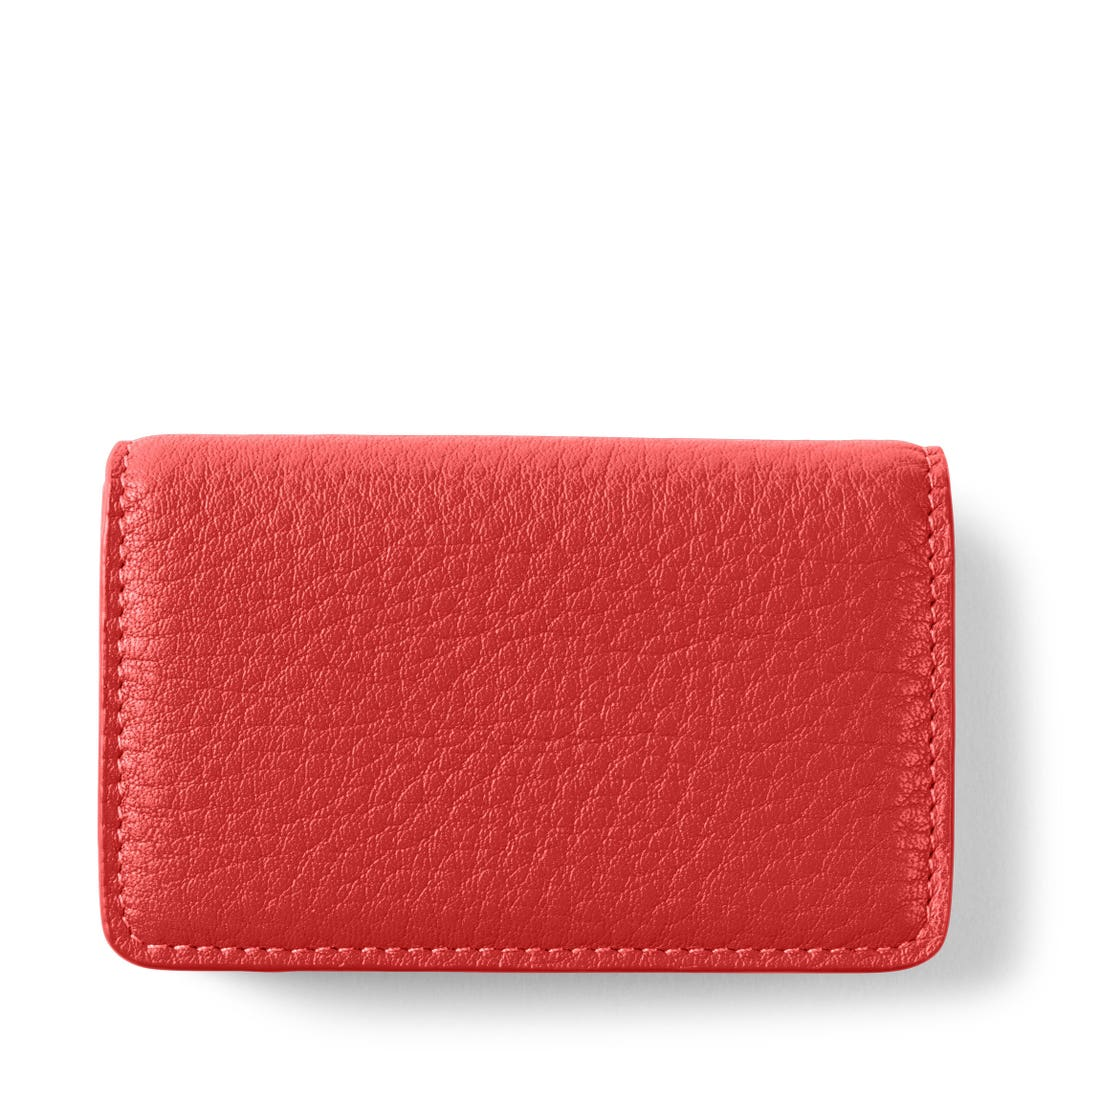 Business Card Case Red 336 337 fullsize